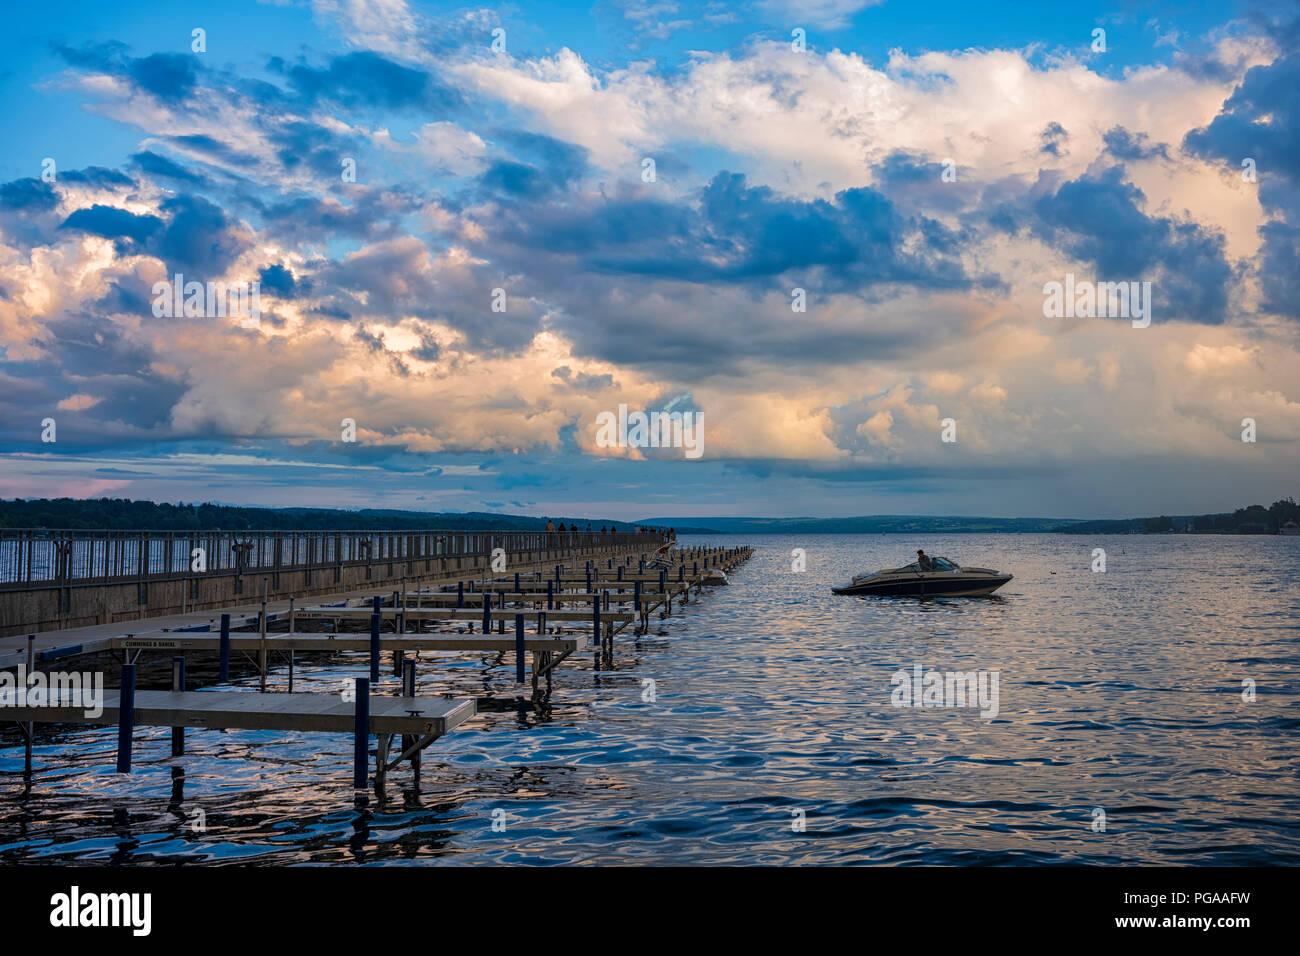 Skaneateles Lake Skaneateles New York Usa August 11 2018 Stock